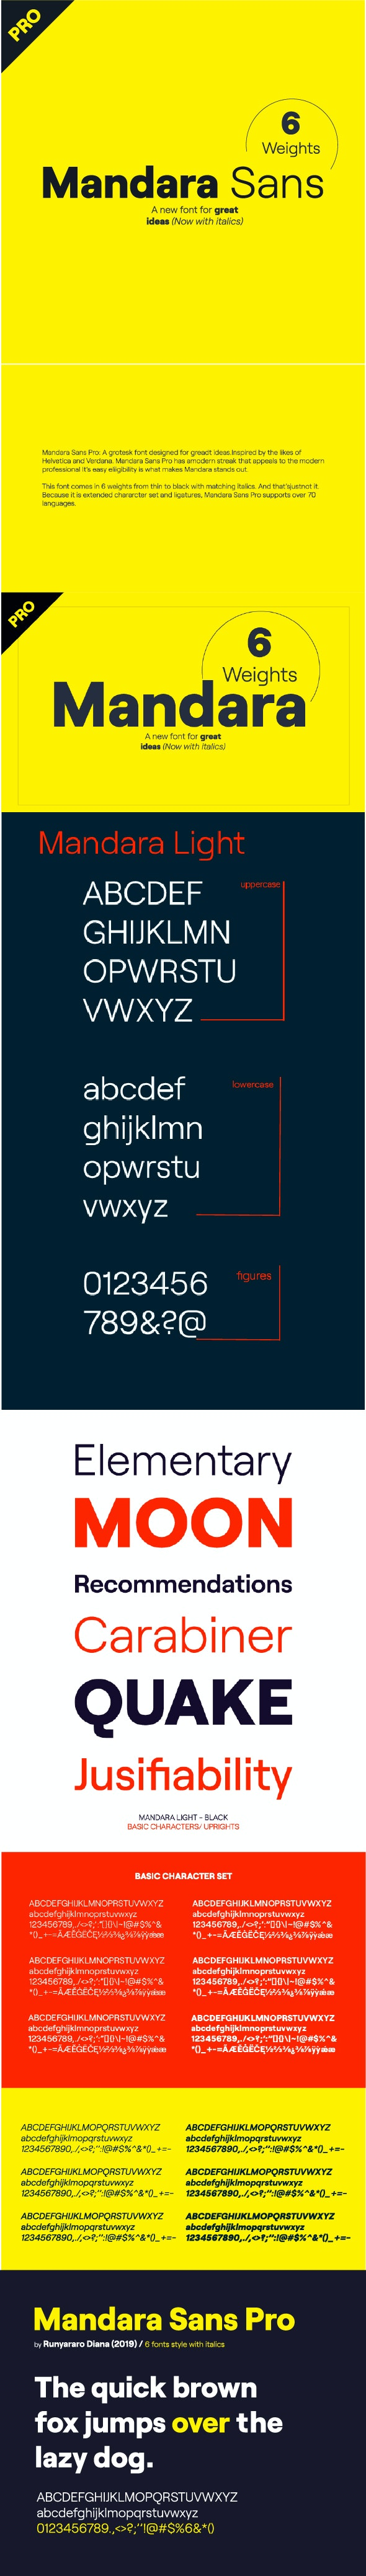 Mandara Sans Pro (6 weights with italics) - Miscellaneous Sans-Serif